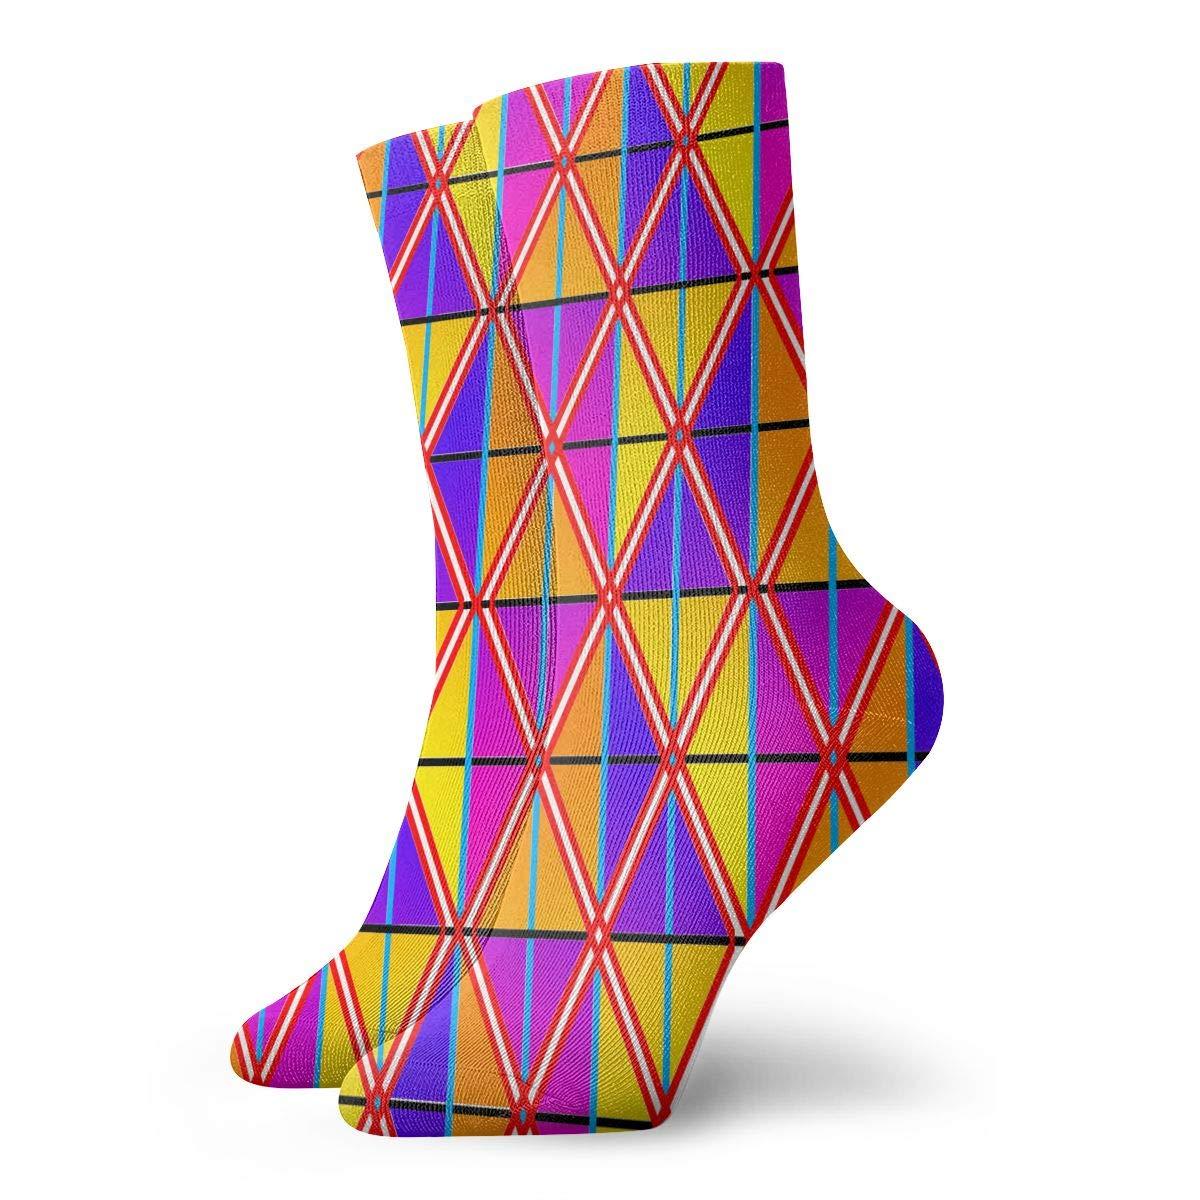 Fun Pattern Unisex Funny Casual Crew Socks Athletic Socks For Boys Girls Kids Teenagers